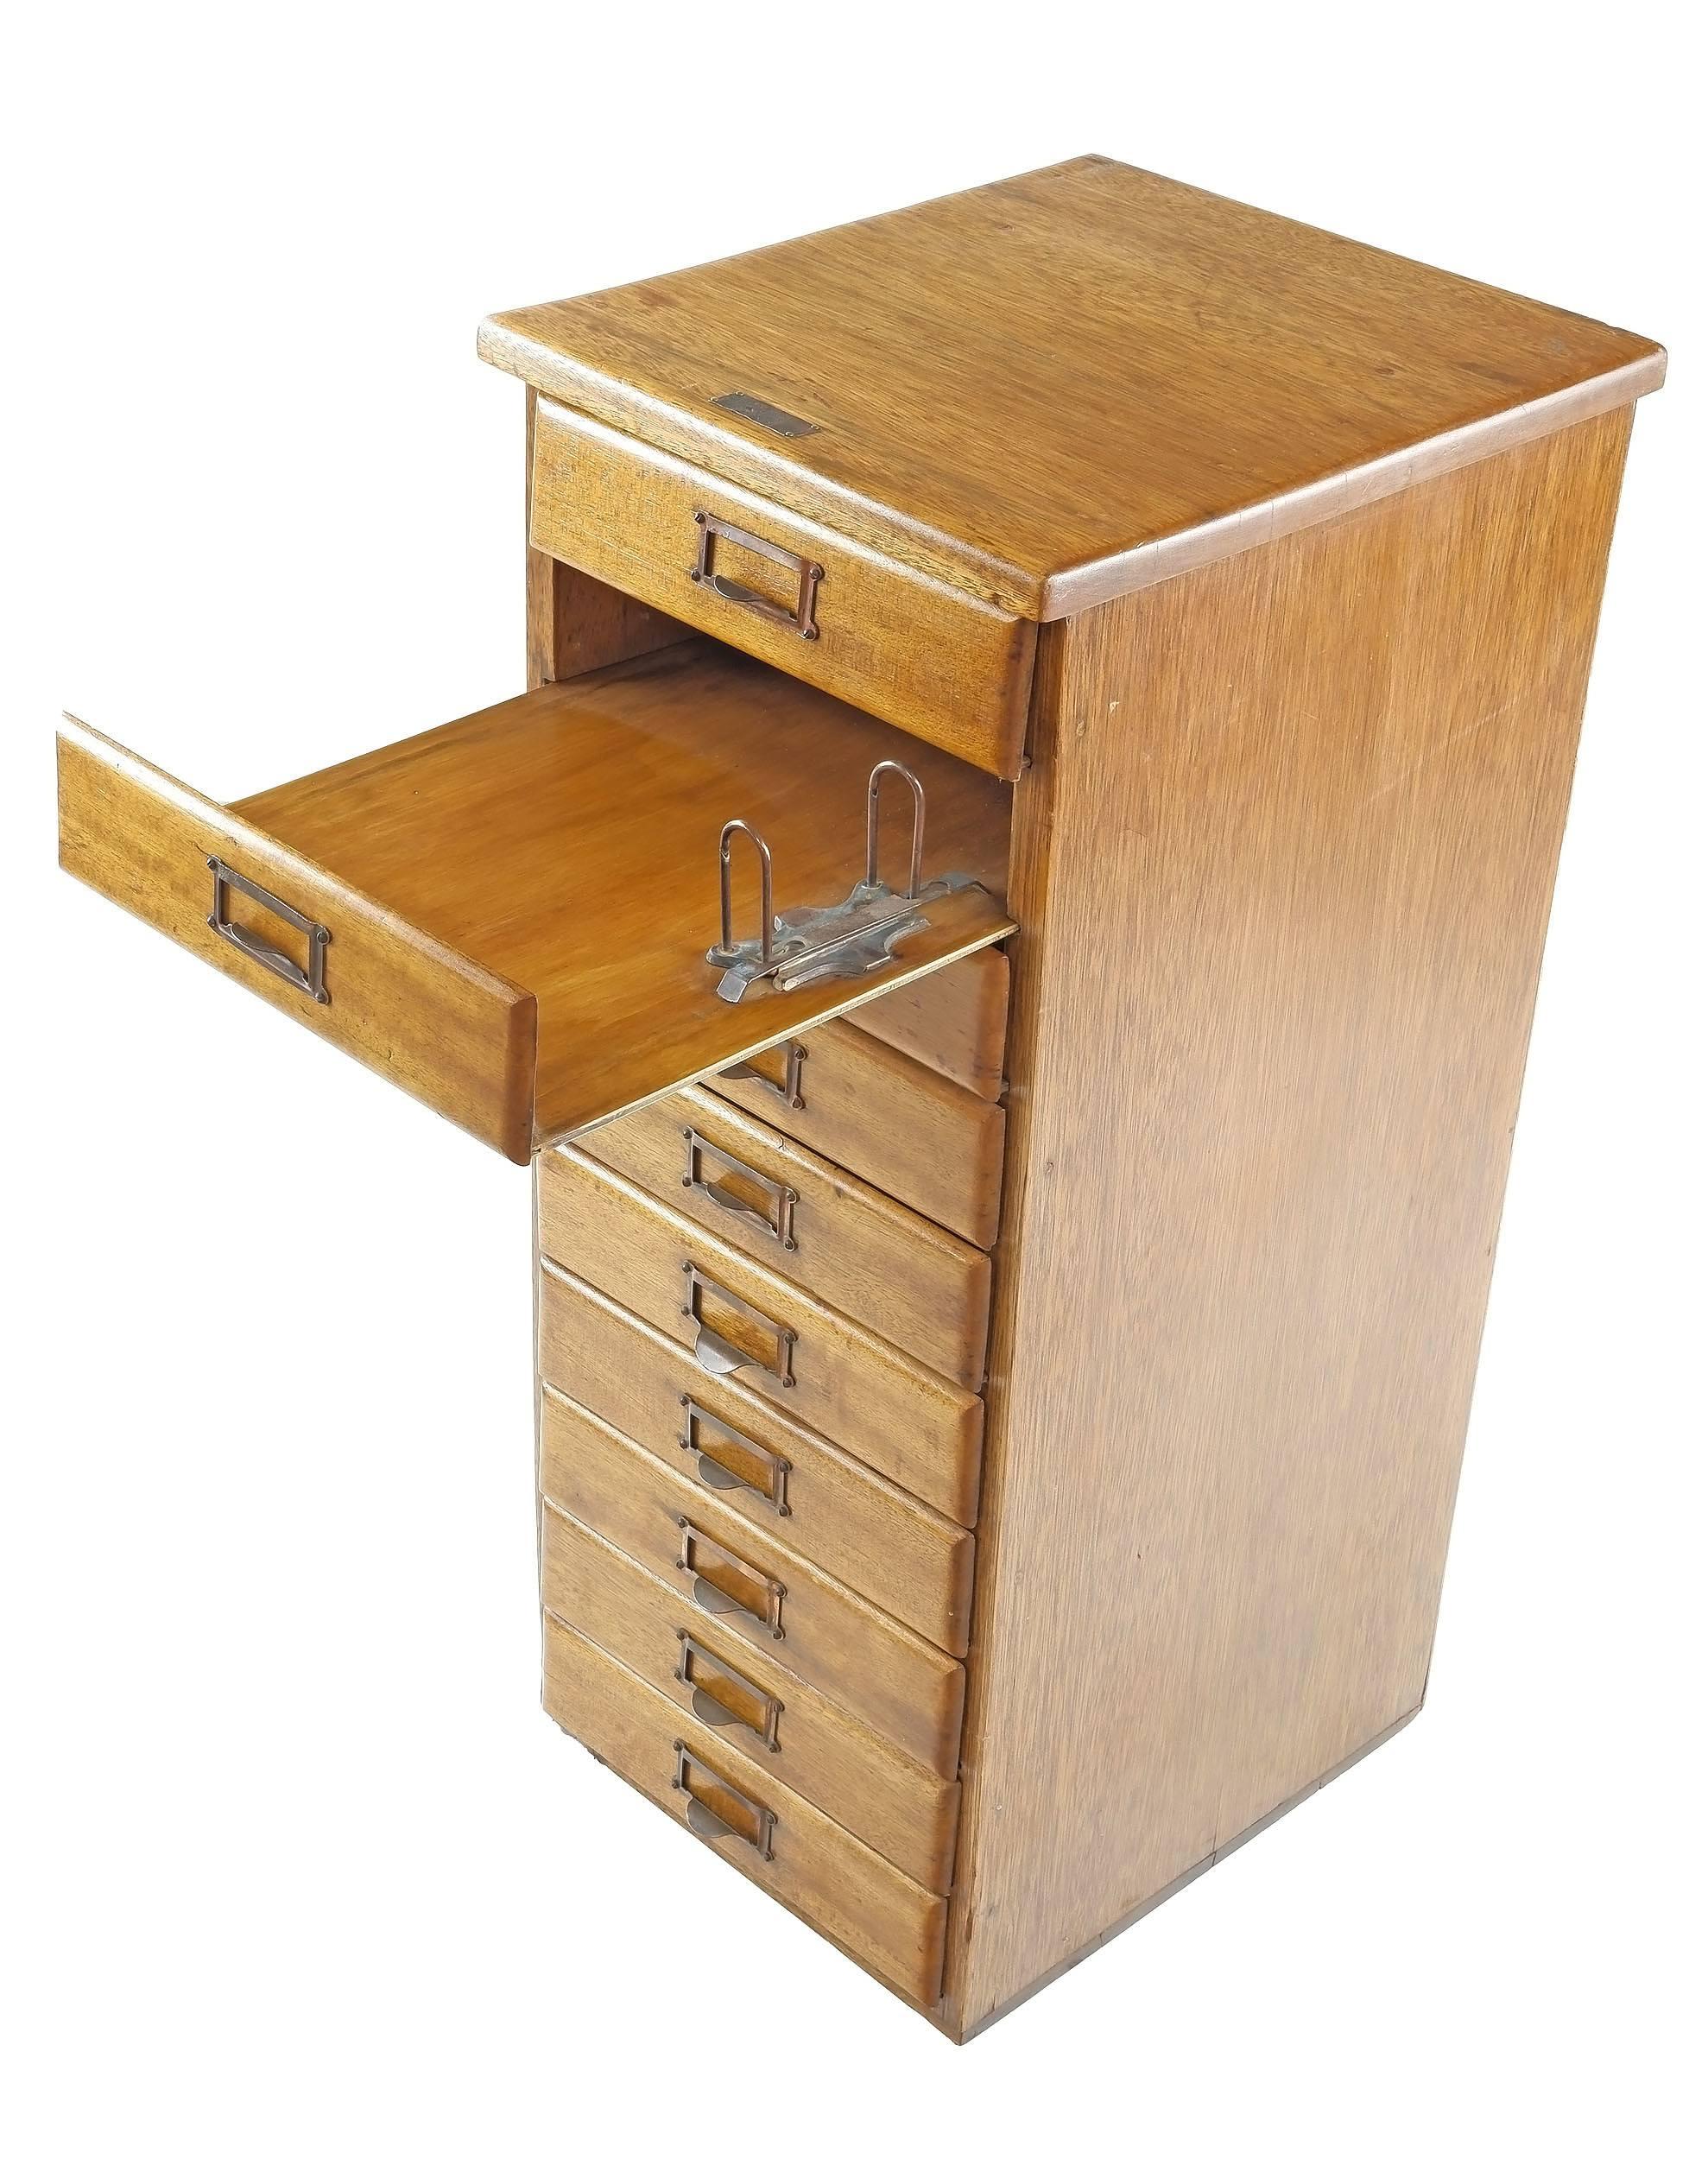 'Scott & Underwood Sydney Maple Document File Cabinet, Circa 1930s'